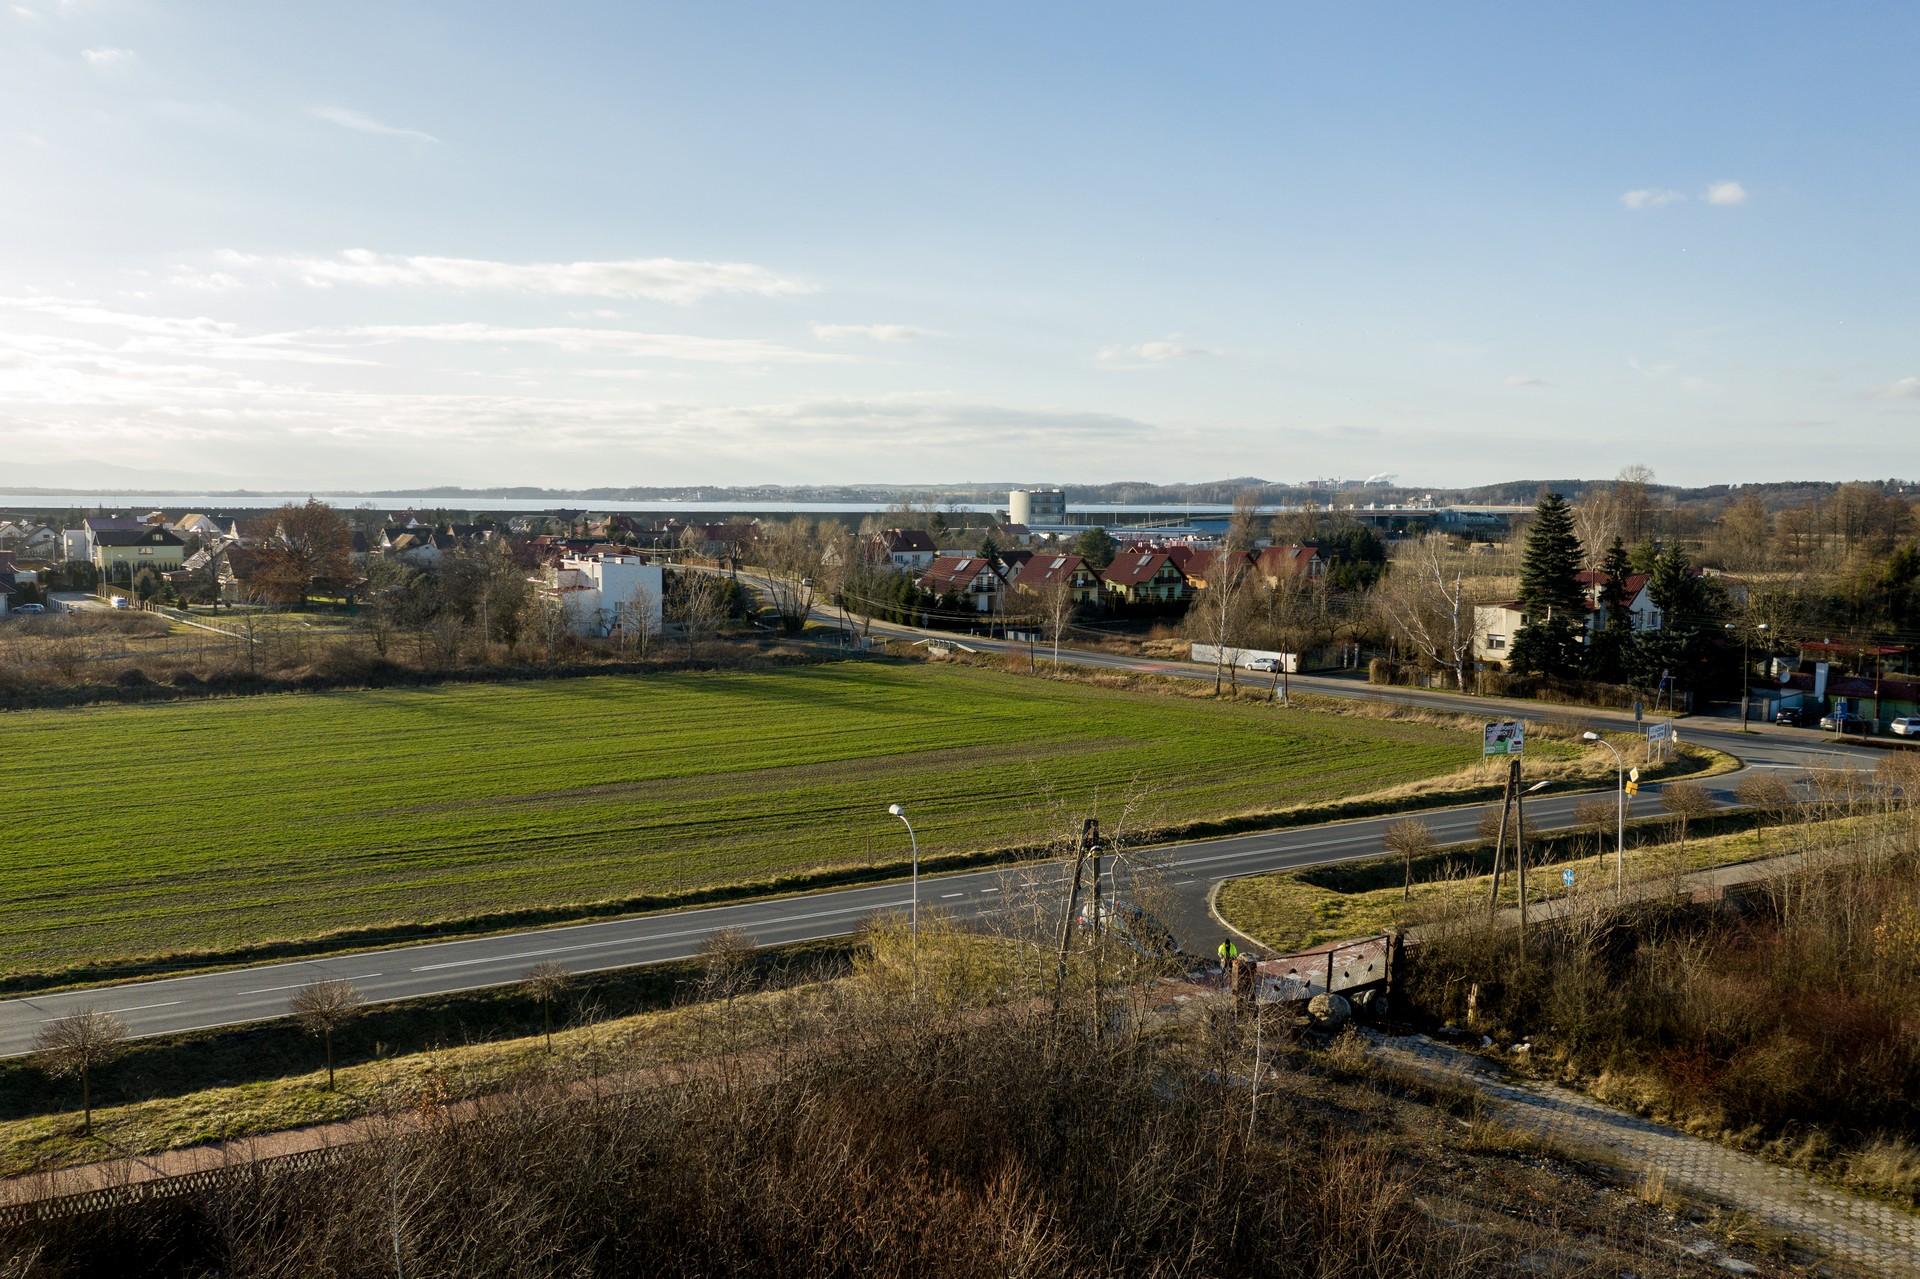 Belweder Park Nysa Zdjecia z Drona 20.02.2020 8